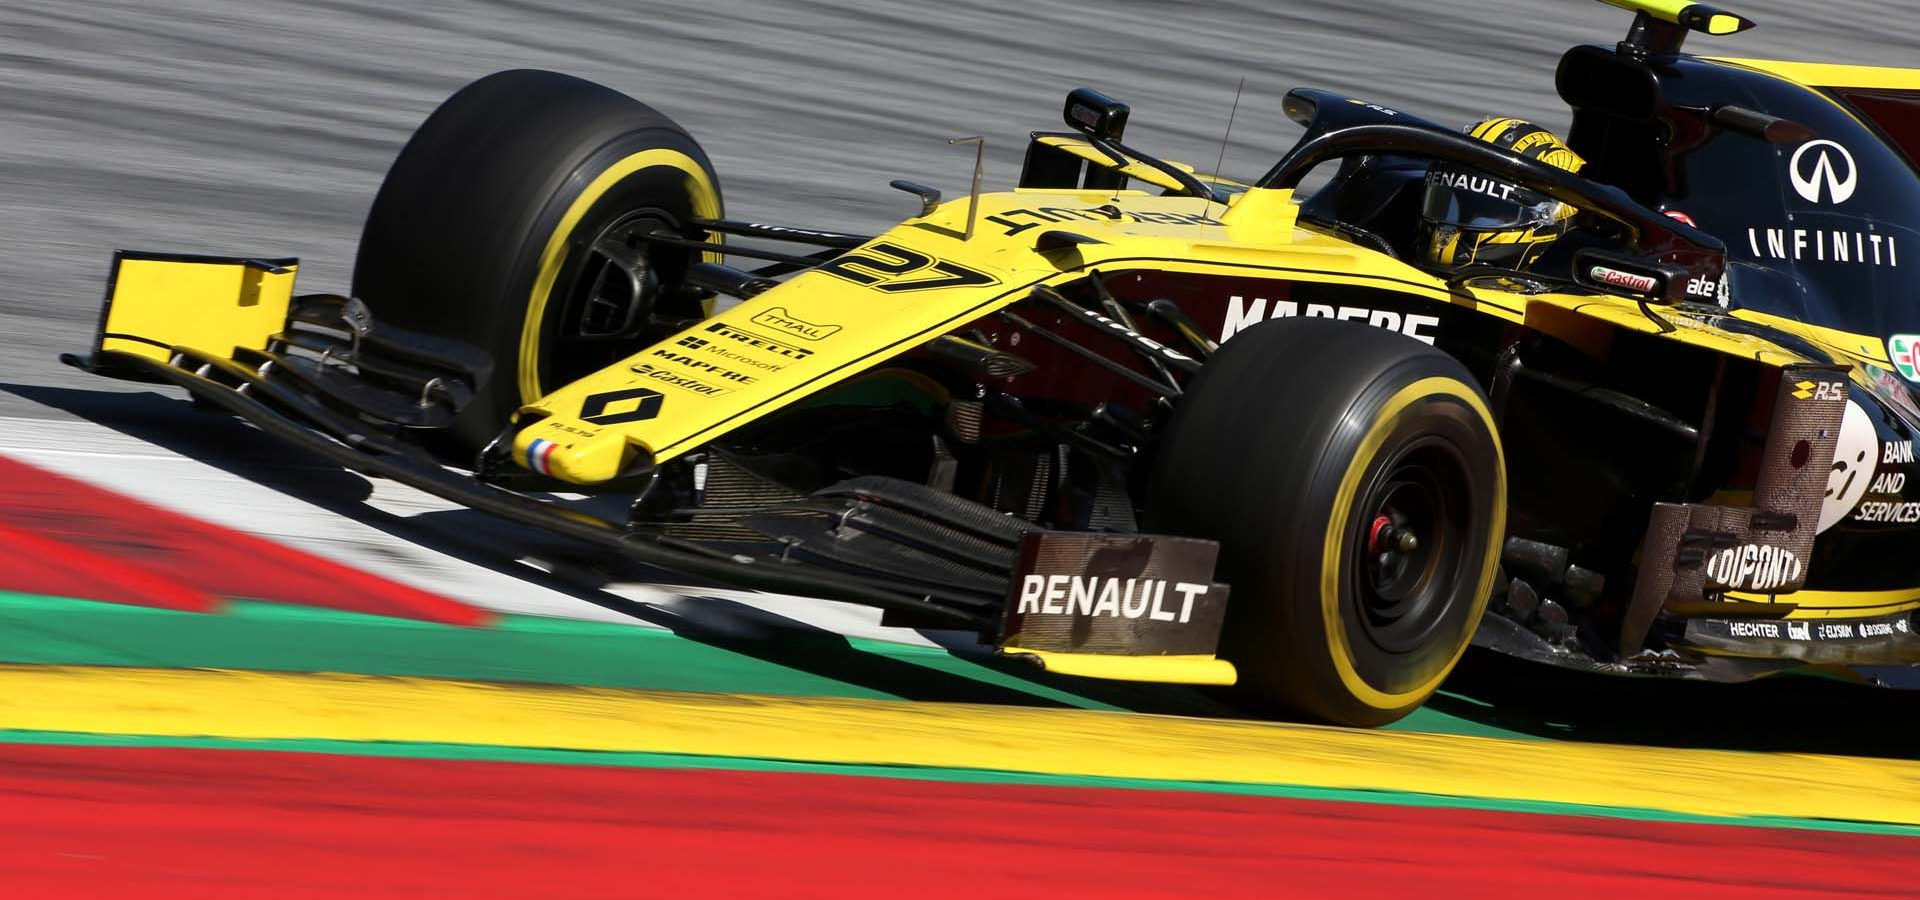 Nico Hulkenberg (GER) Renault F1 Team RS19. Austrian Grand Prix, Sunday 30th June 2019. Spielberg, Austria. Hülkenberg